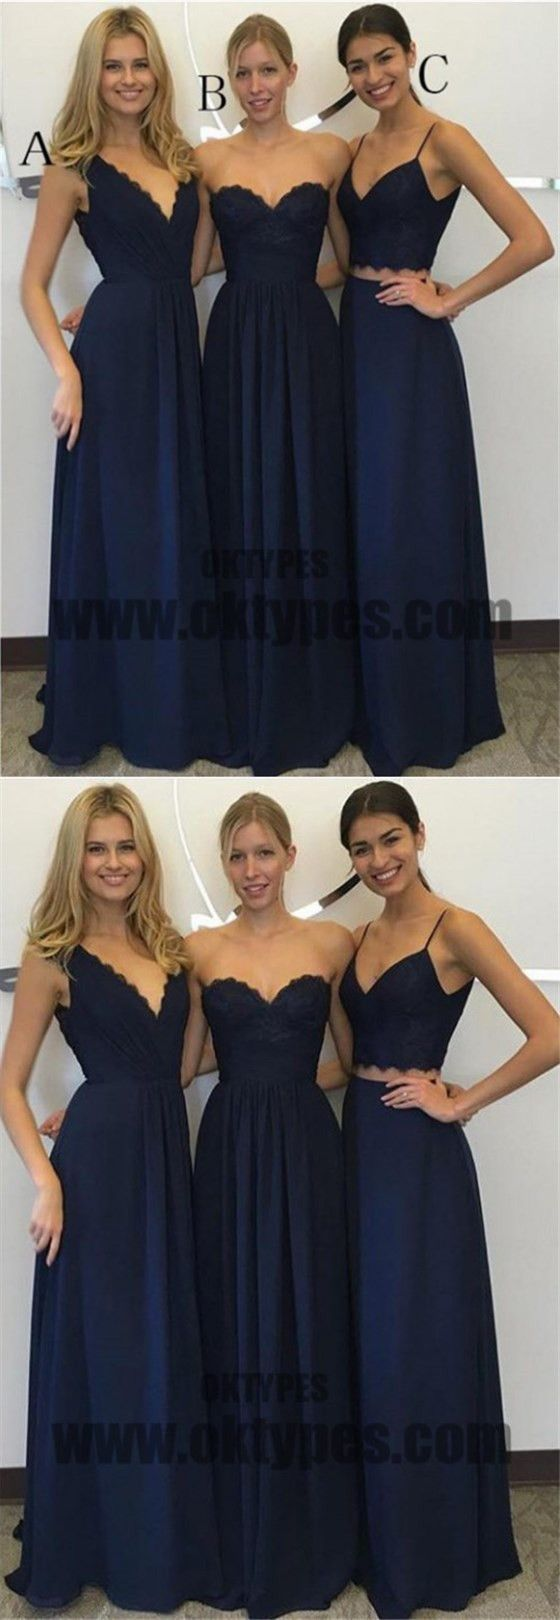 A line bridesmaid dresses navy blue bridesmaid dresses long